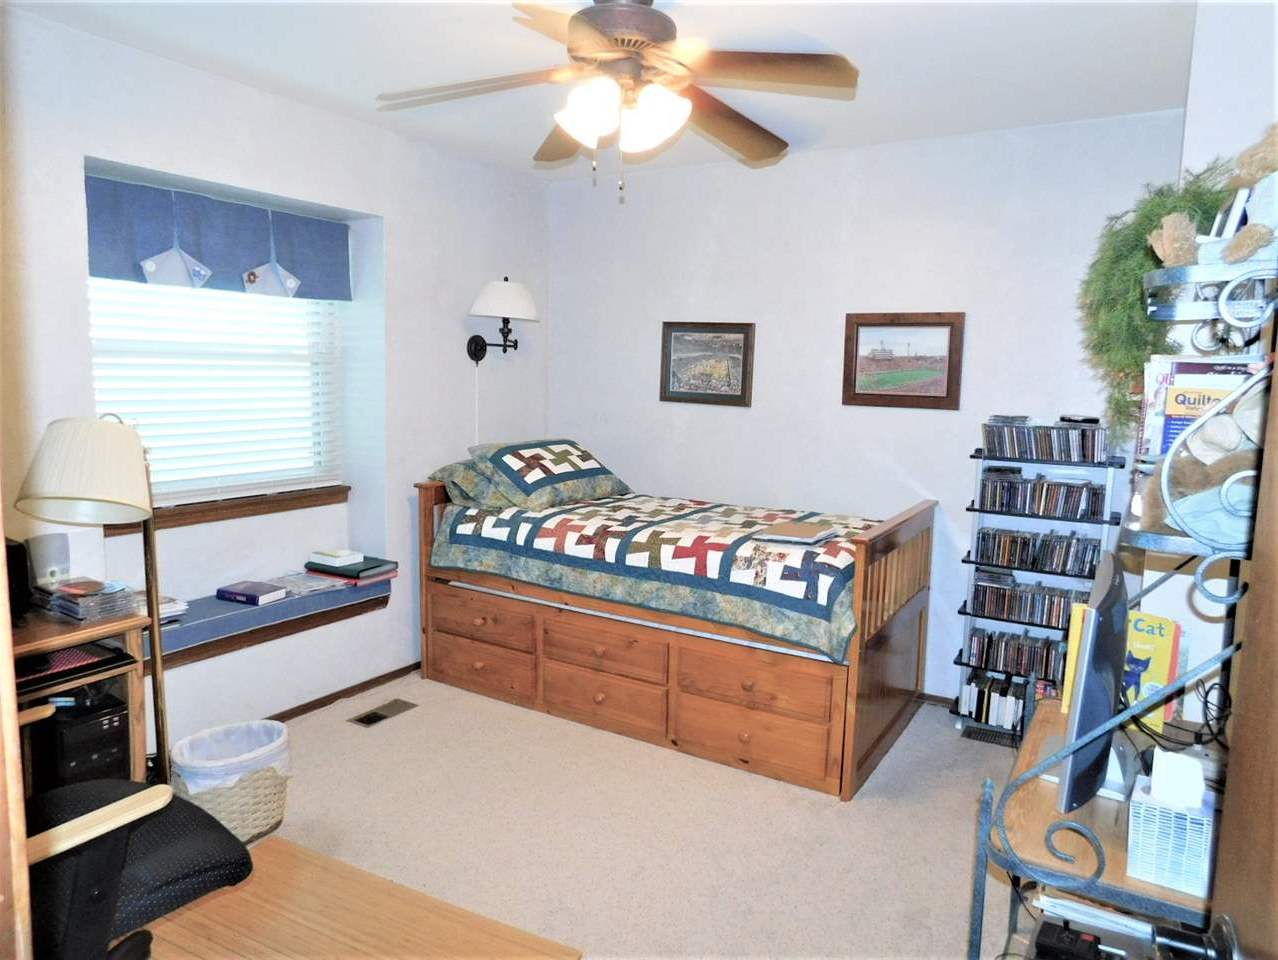 Sold Intraoffice W/MLS | 279 Braden School Rd.  Ponca City, OK 74604 18